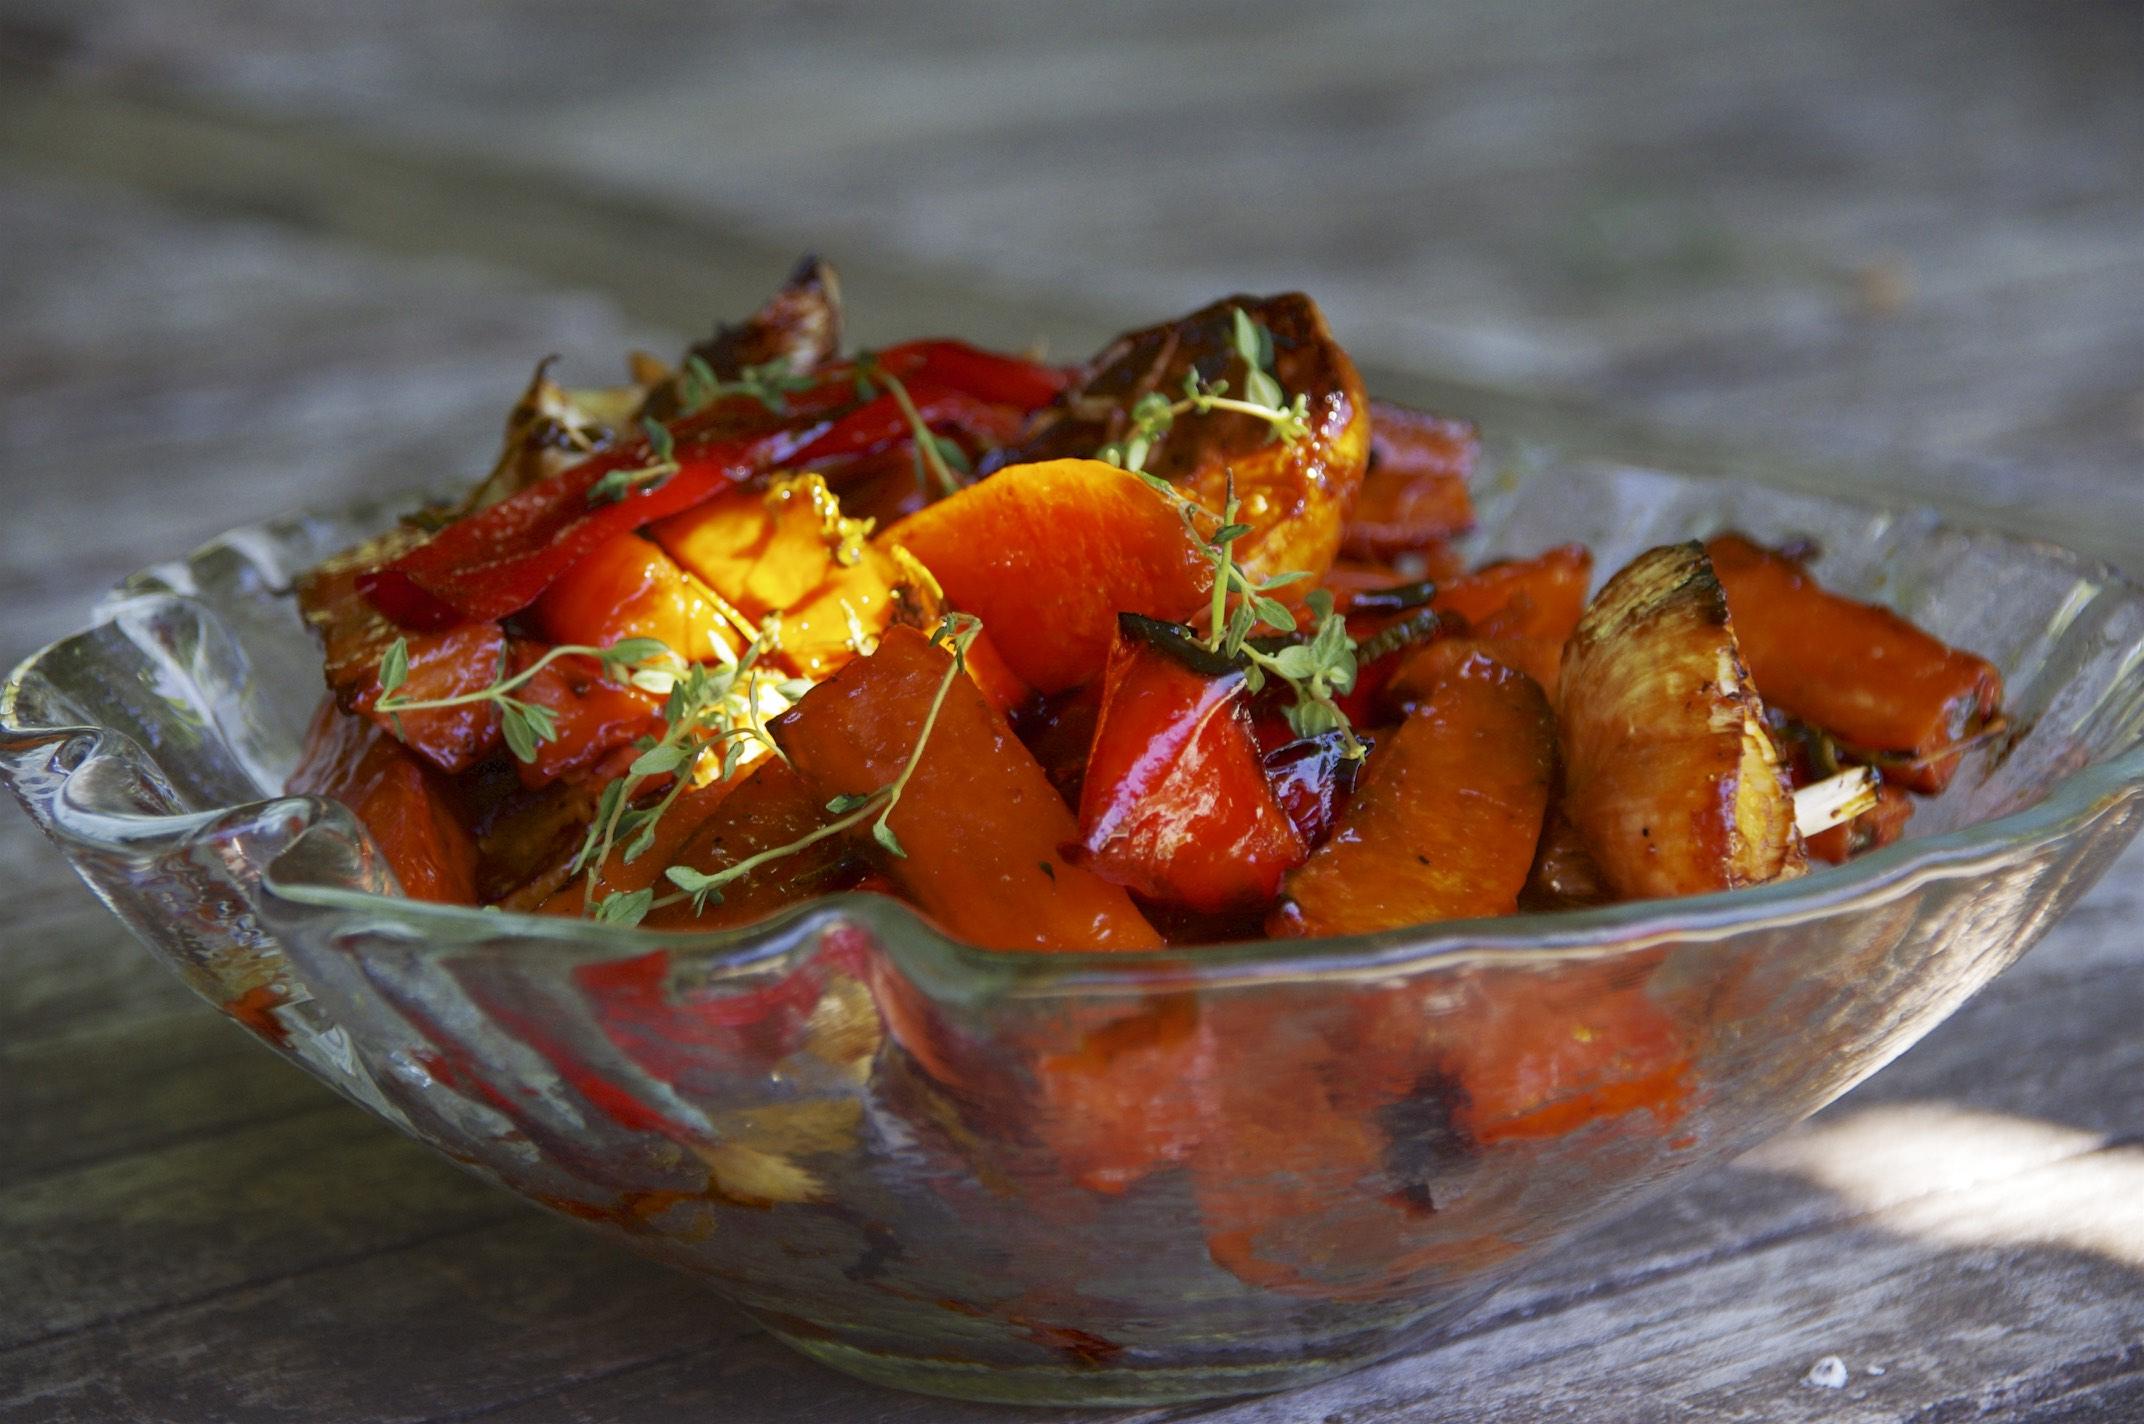 Sweet potato with caramalised orange and bitters.jpg